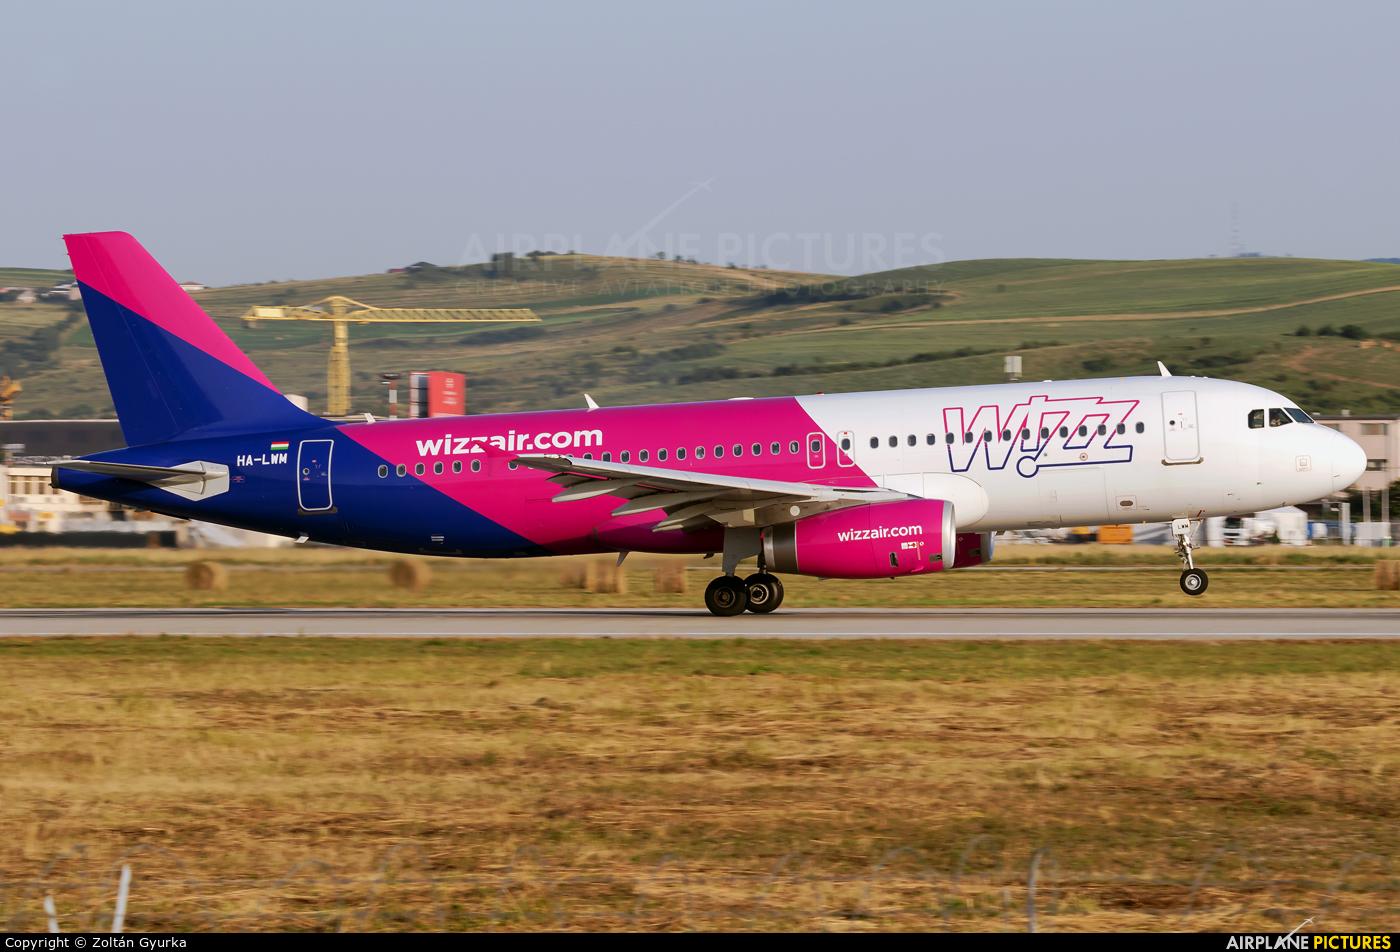 Wizz Air HA-LWM aircraft at Cluj Napoca - Someseni